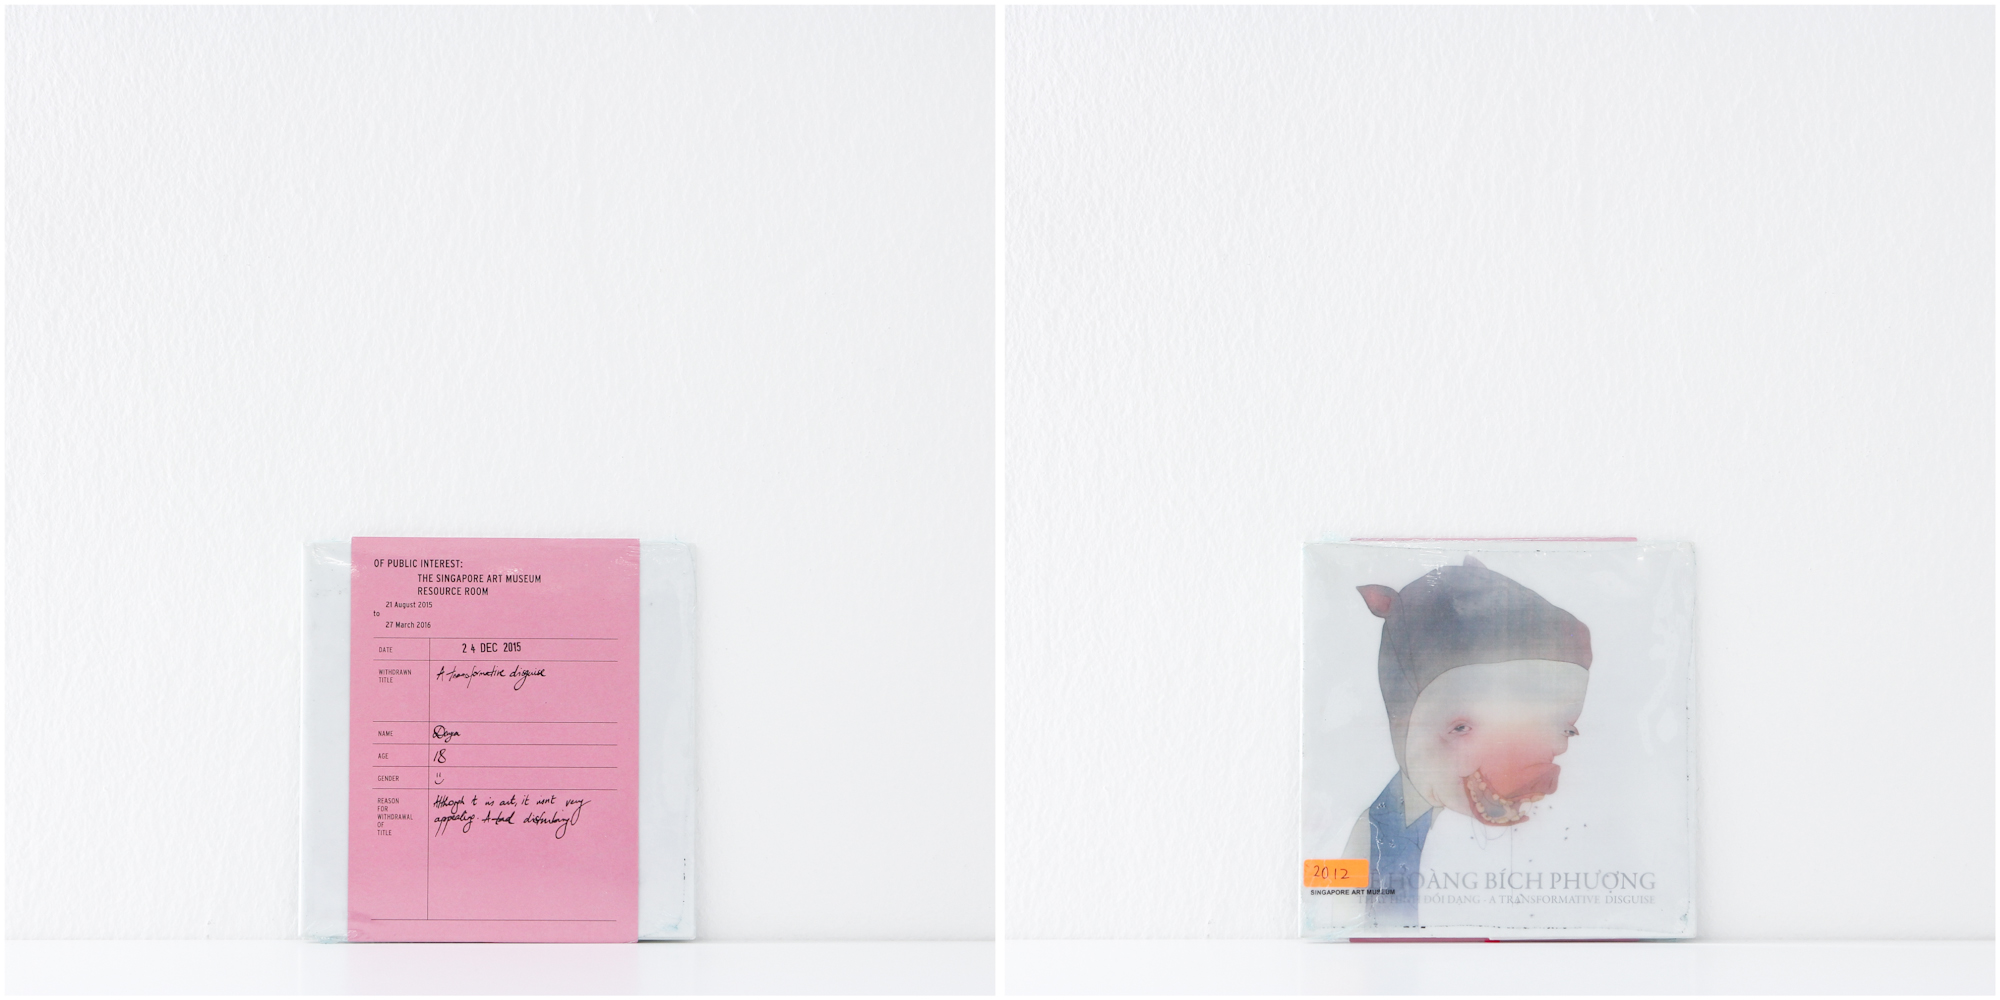 'Thay Hinh Doi Dang, A Transformative Disguise', 24/12/15, Divya, 18, Female